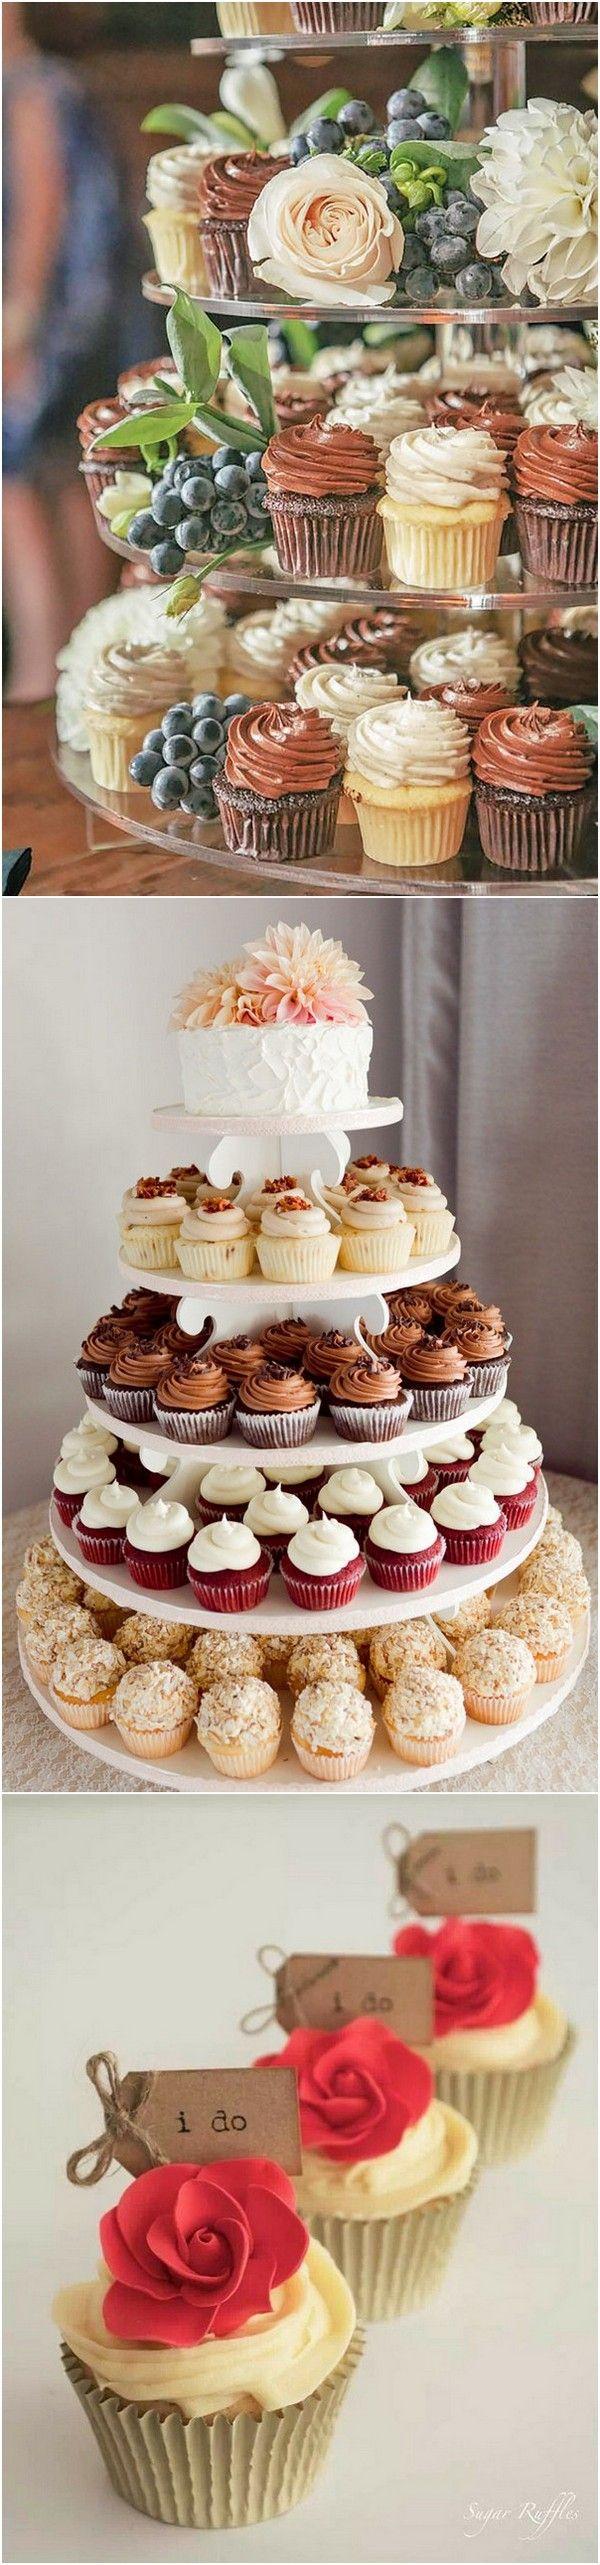 Creative wedding cupcakes